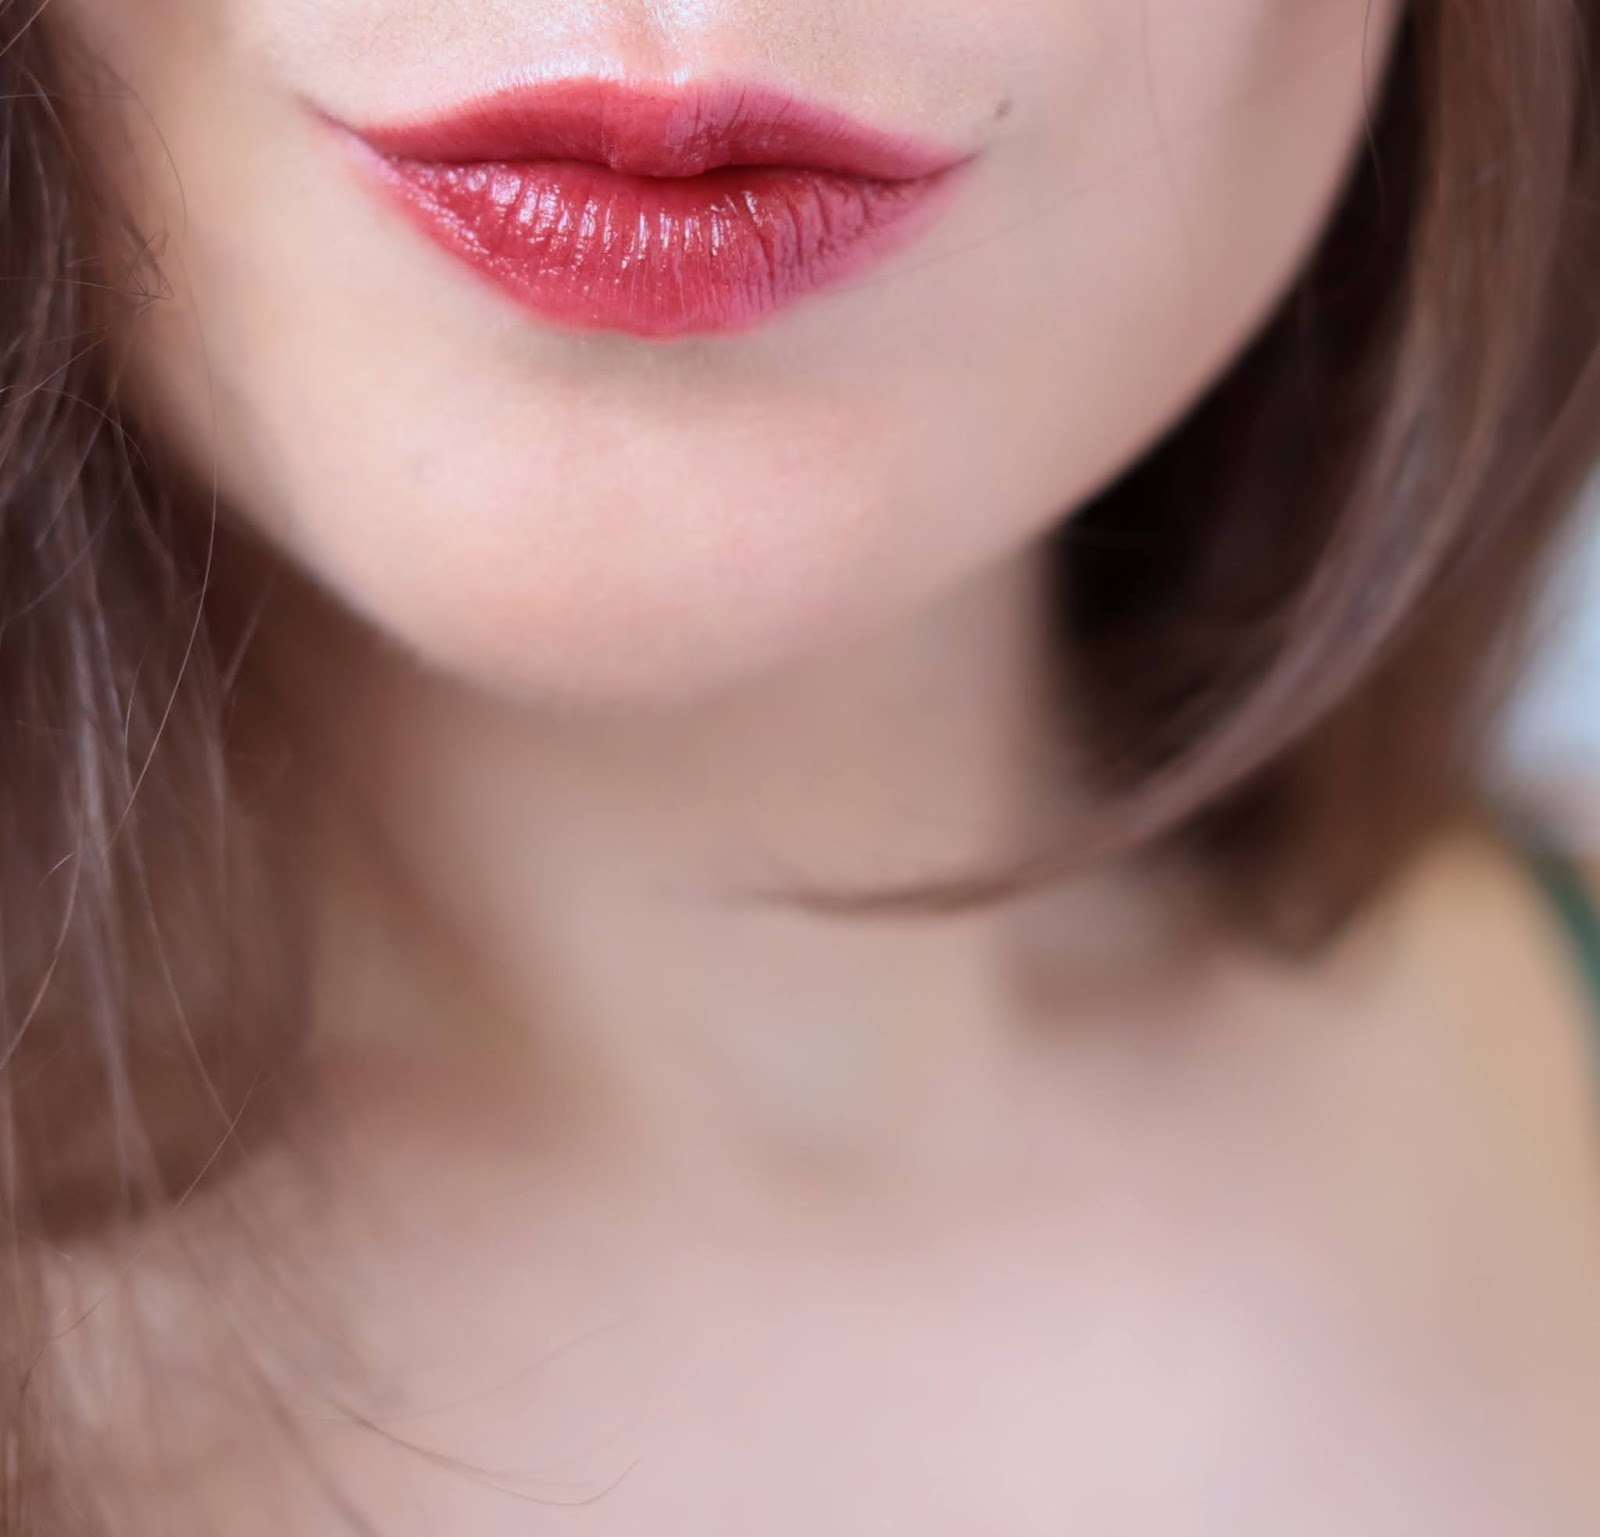 Kjaer Weis Lip Tint Baume à Lèvres Teinté Lover's Choice